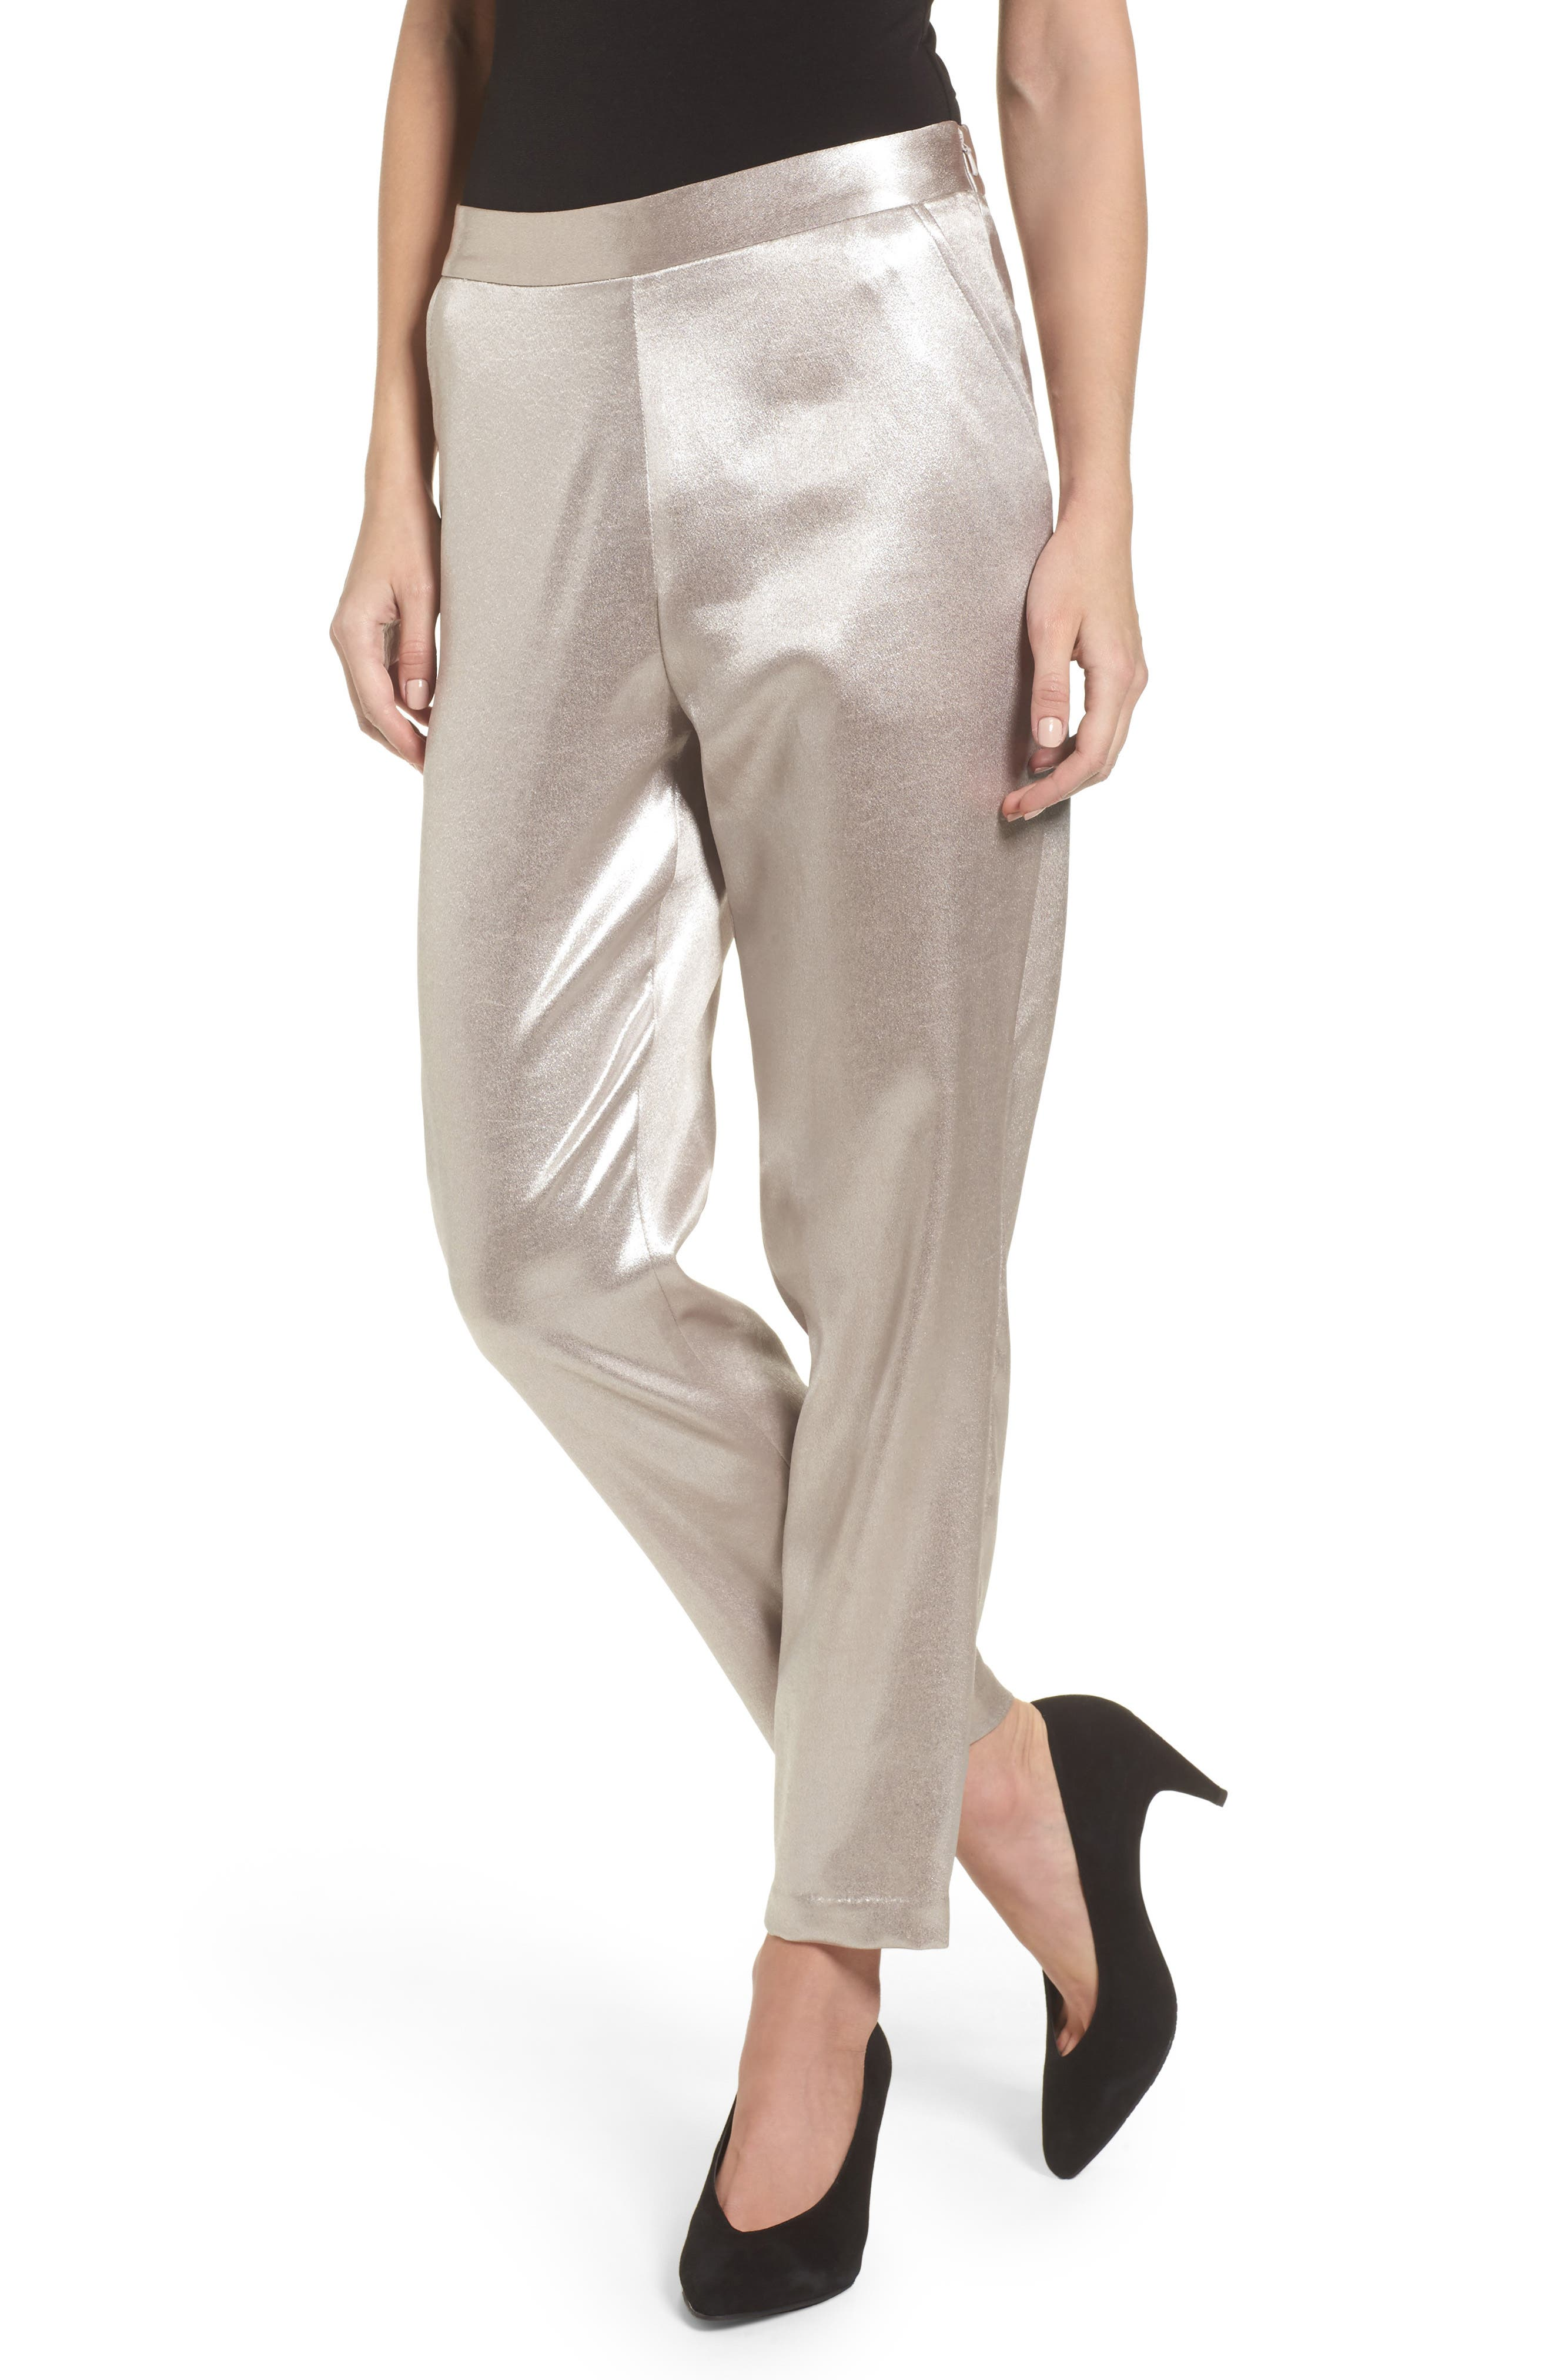 Satin High Waist Ankle Pants,                             Main thumbnail 1, color,                             Grey Chateau Metallic